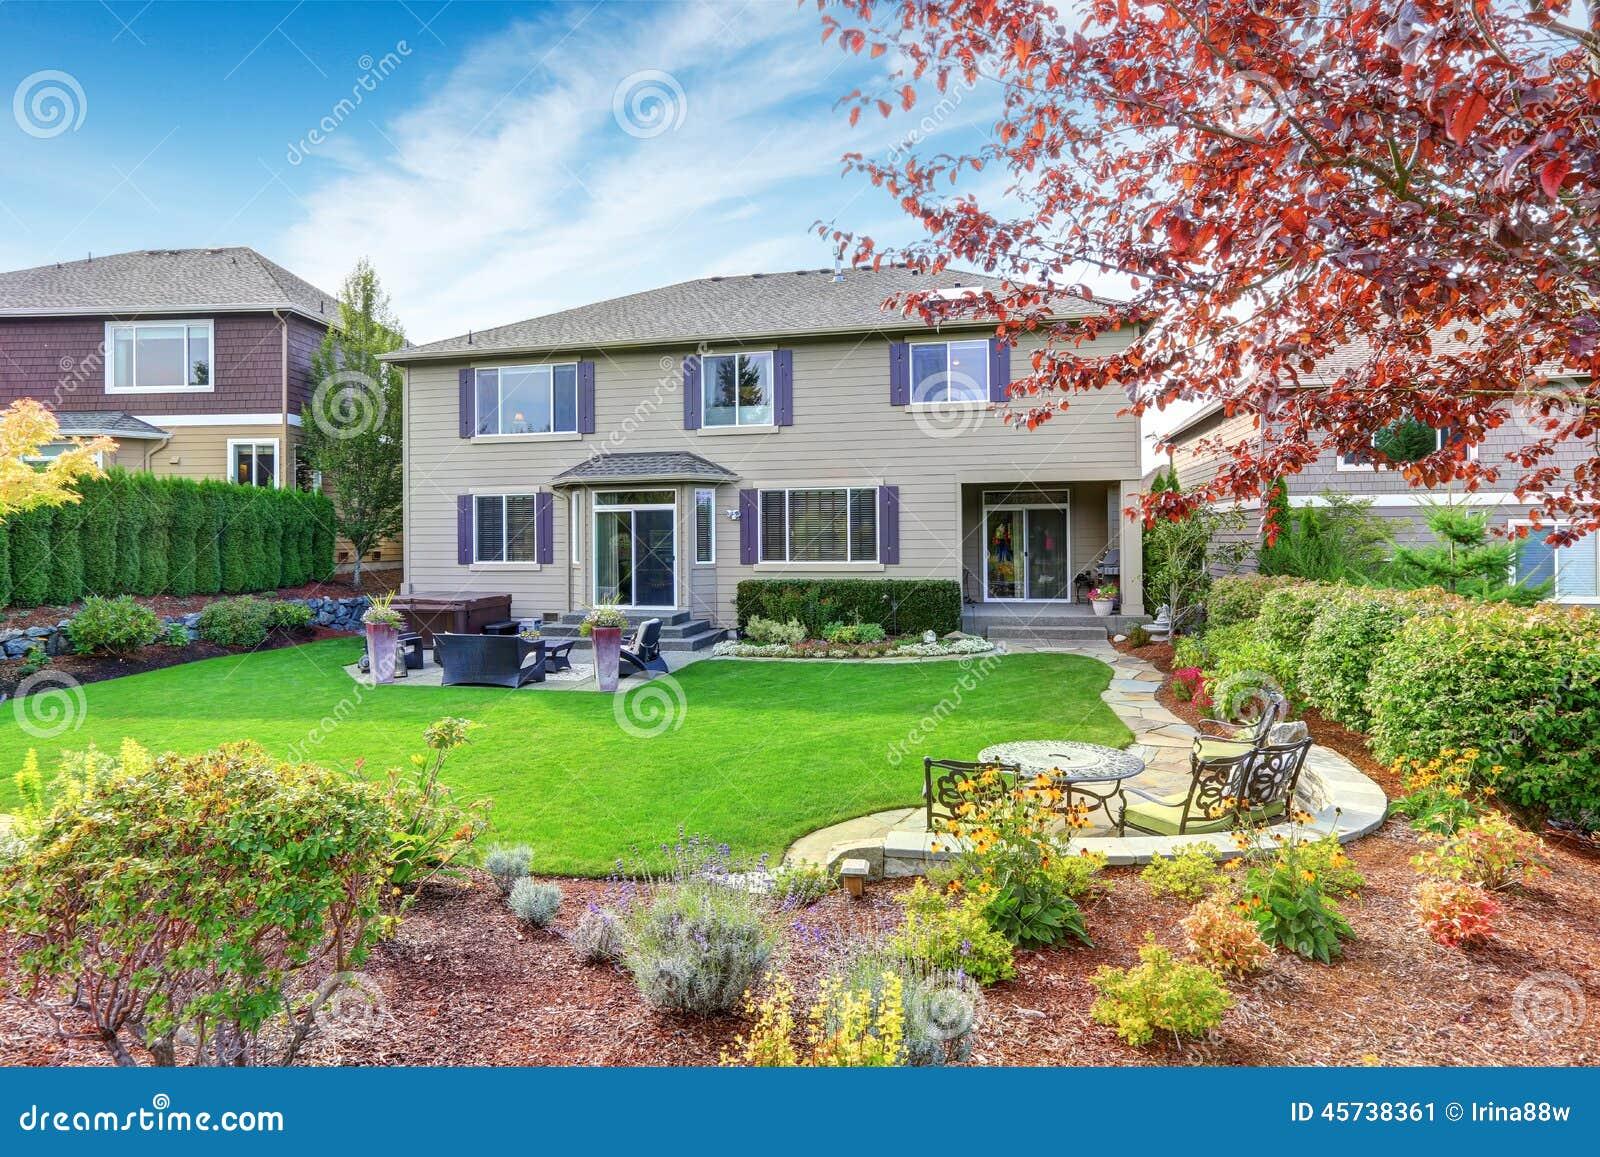 Casa de lujo exterior con dise o impresionante del paisaje for Diseno patio exterior casa